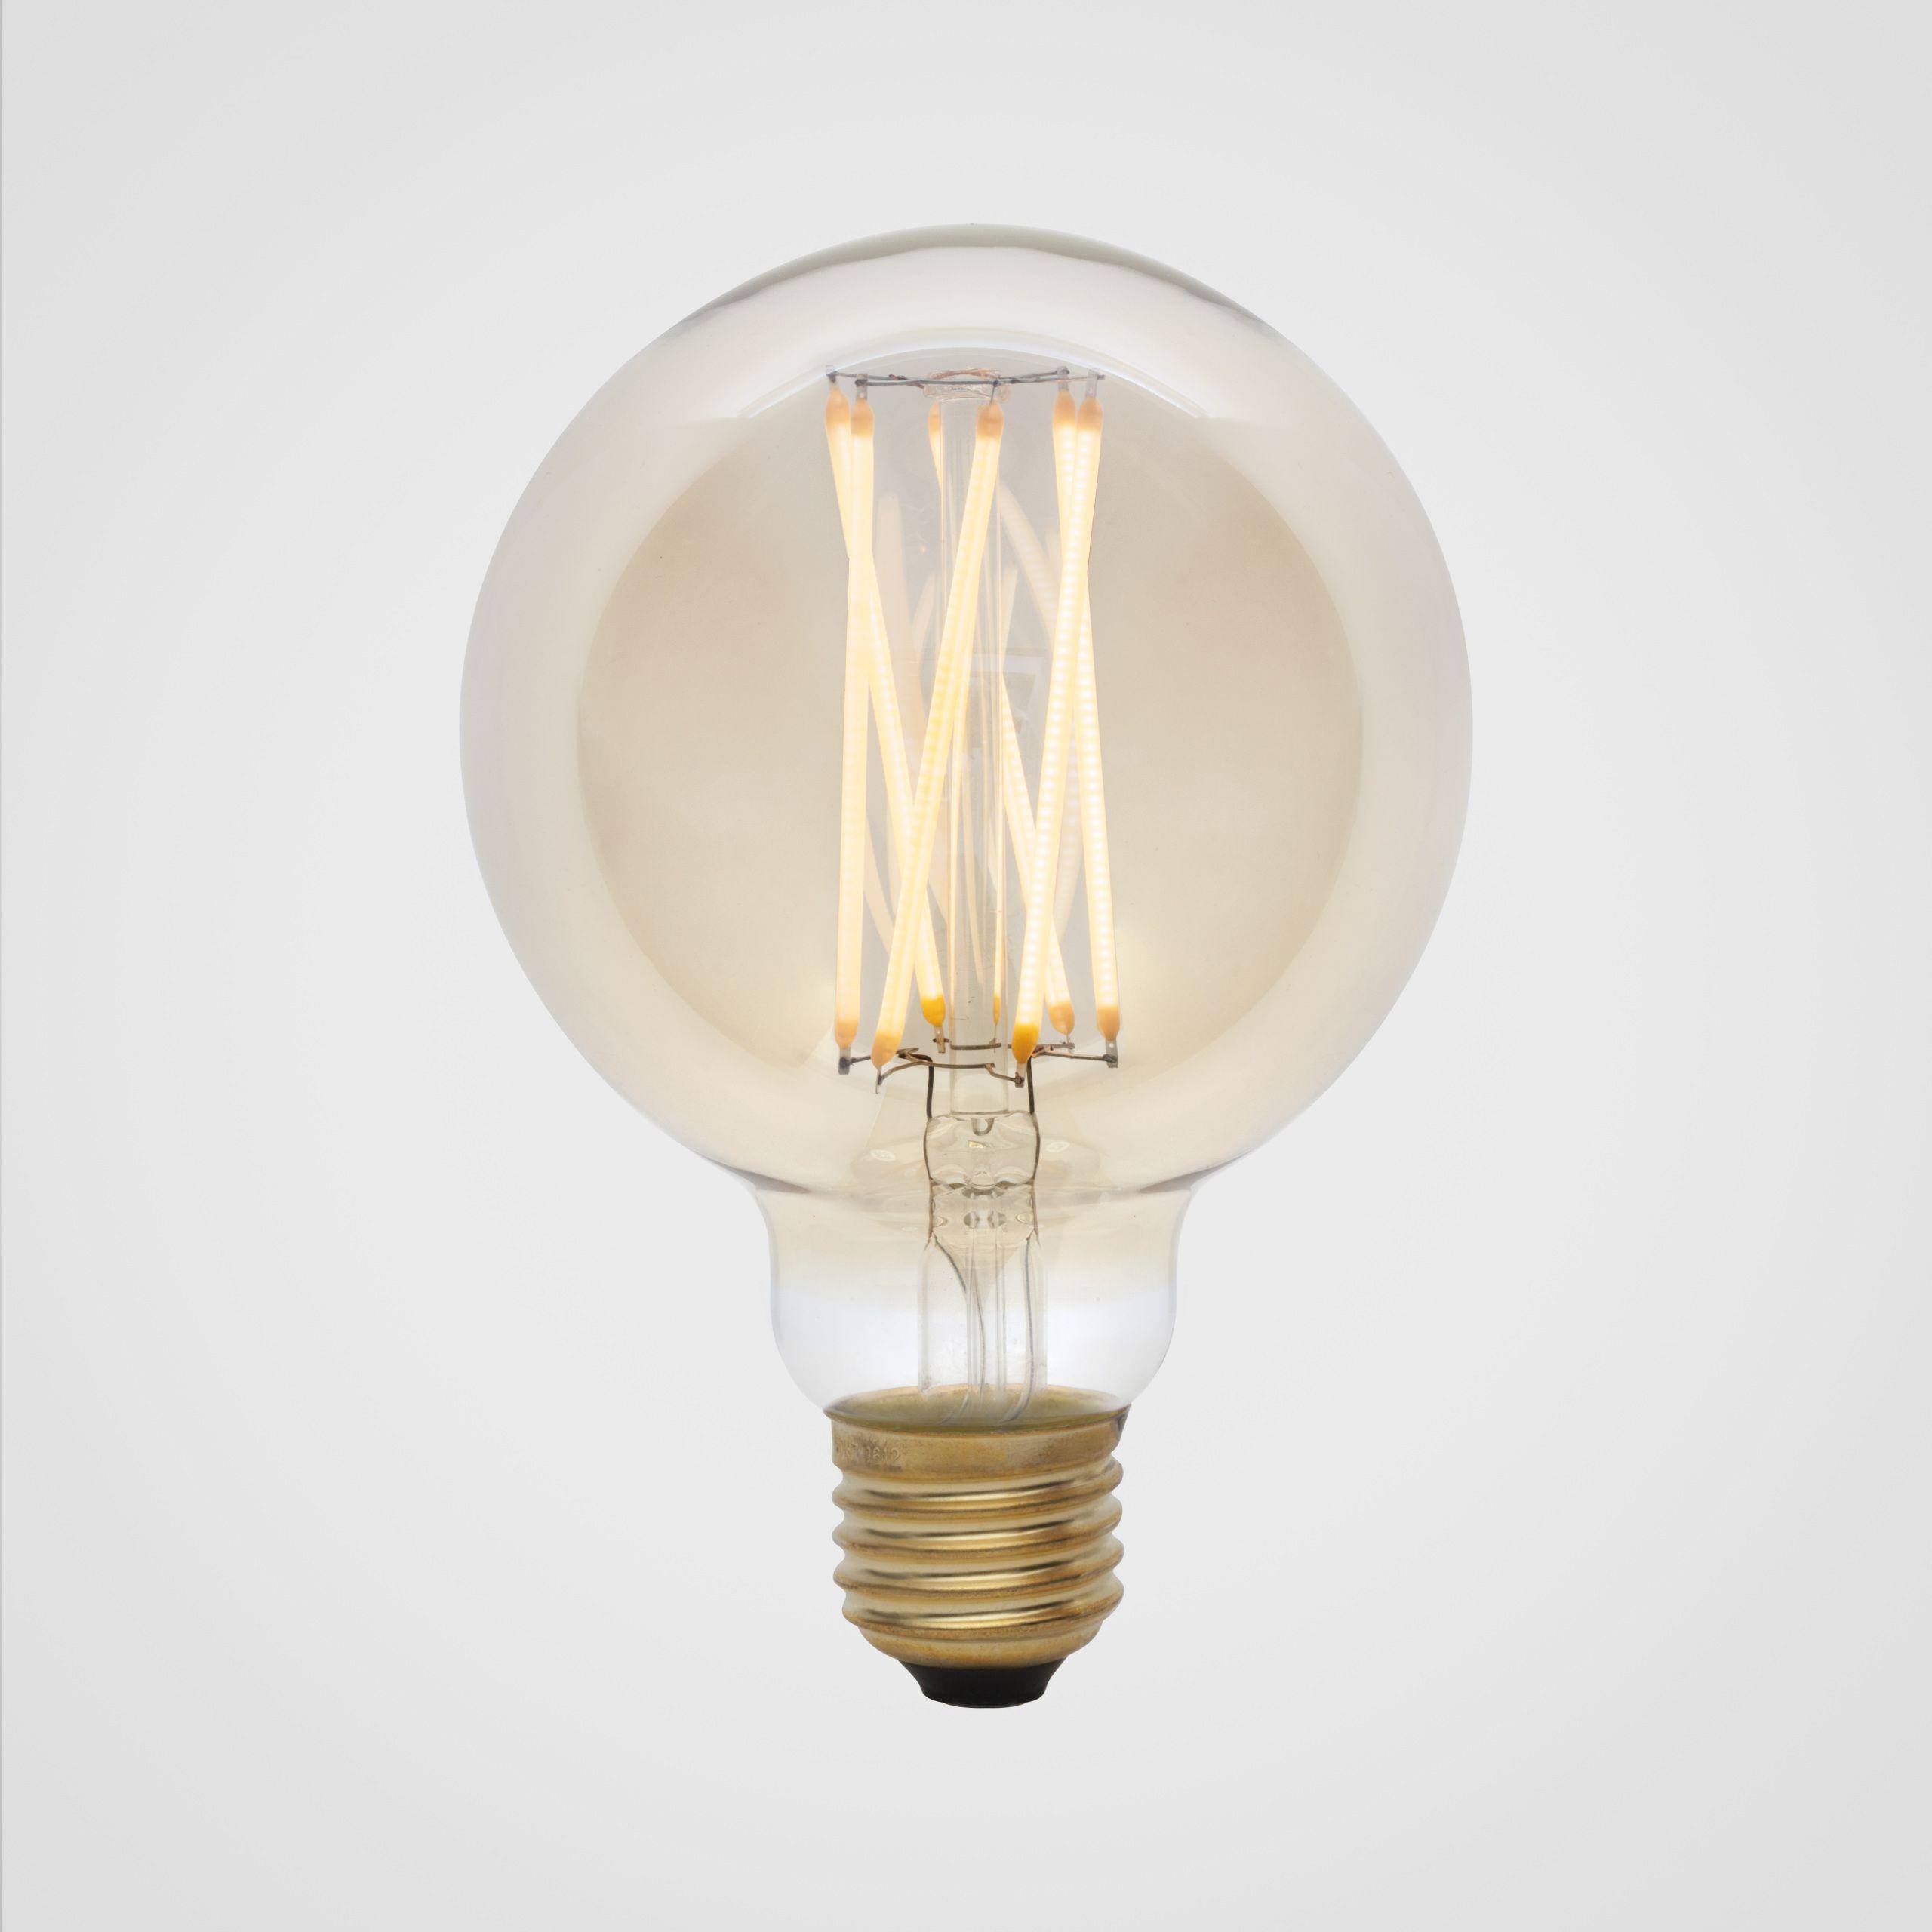 Elva Exposed Filament Light Lighting Pendant